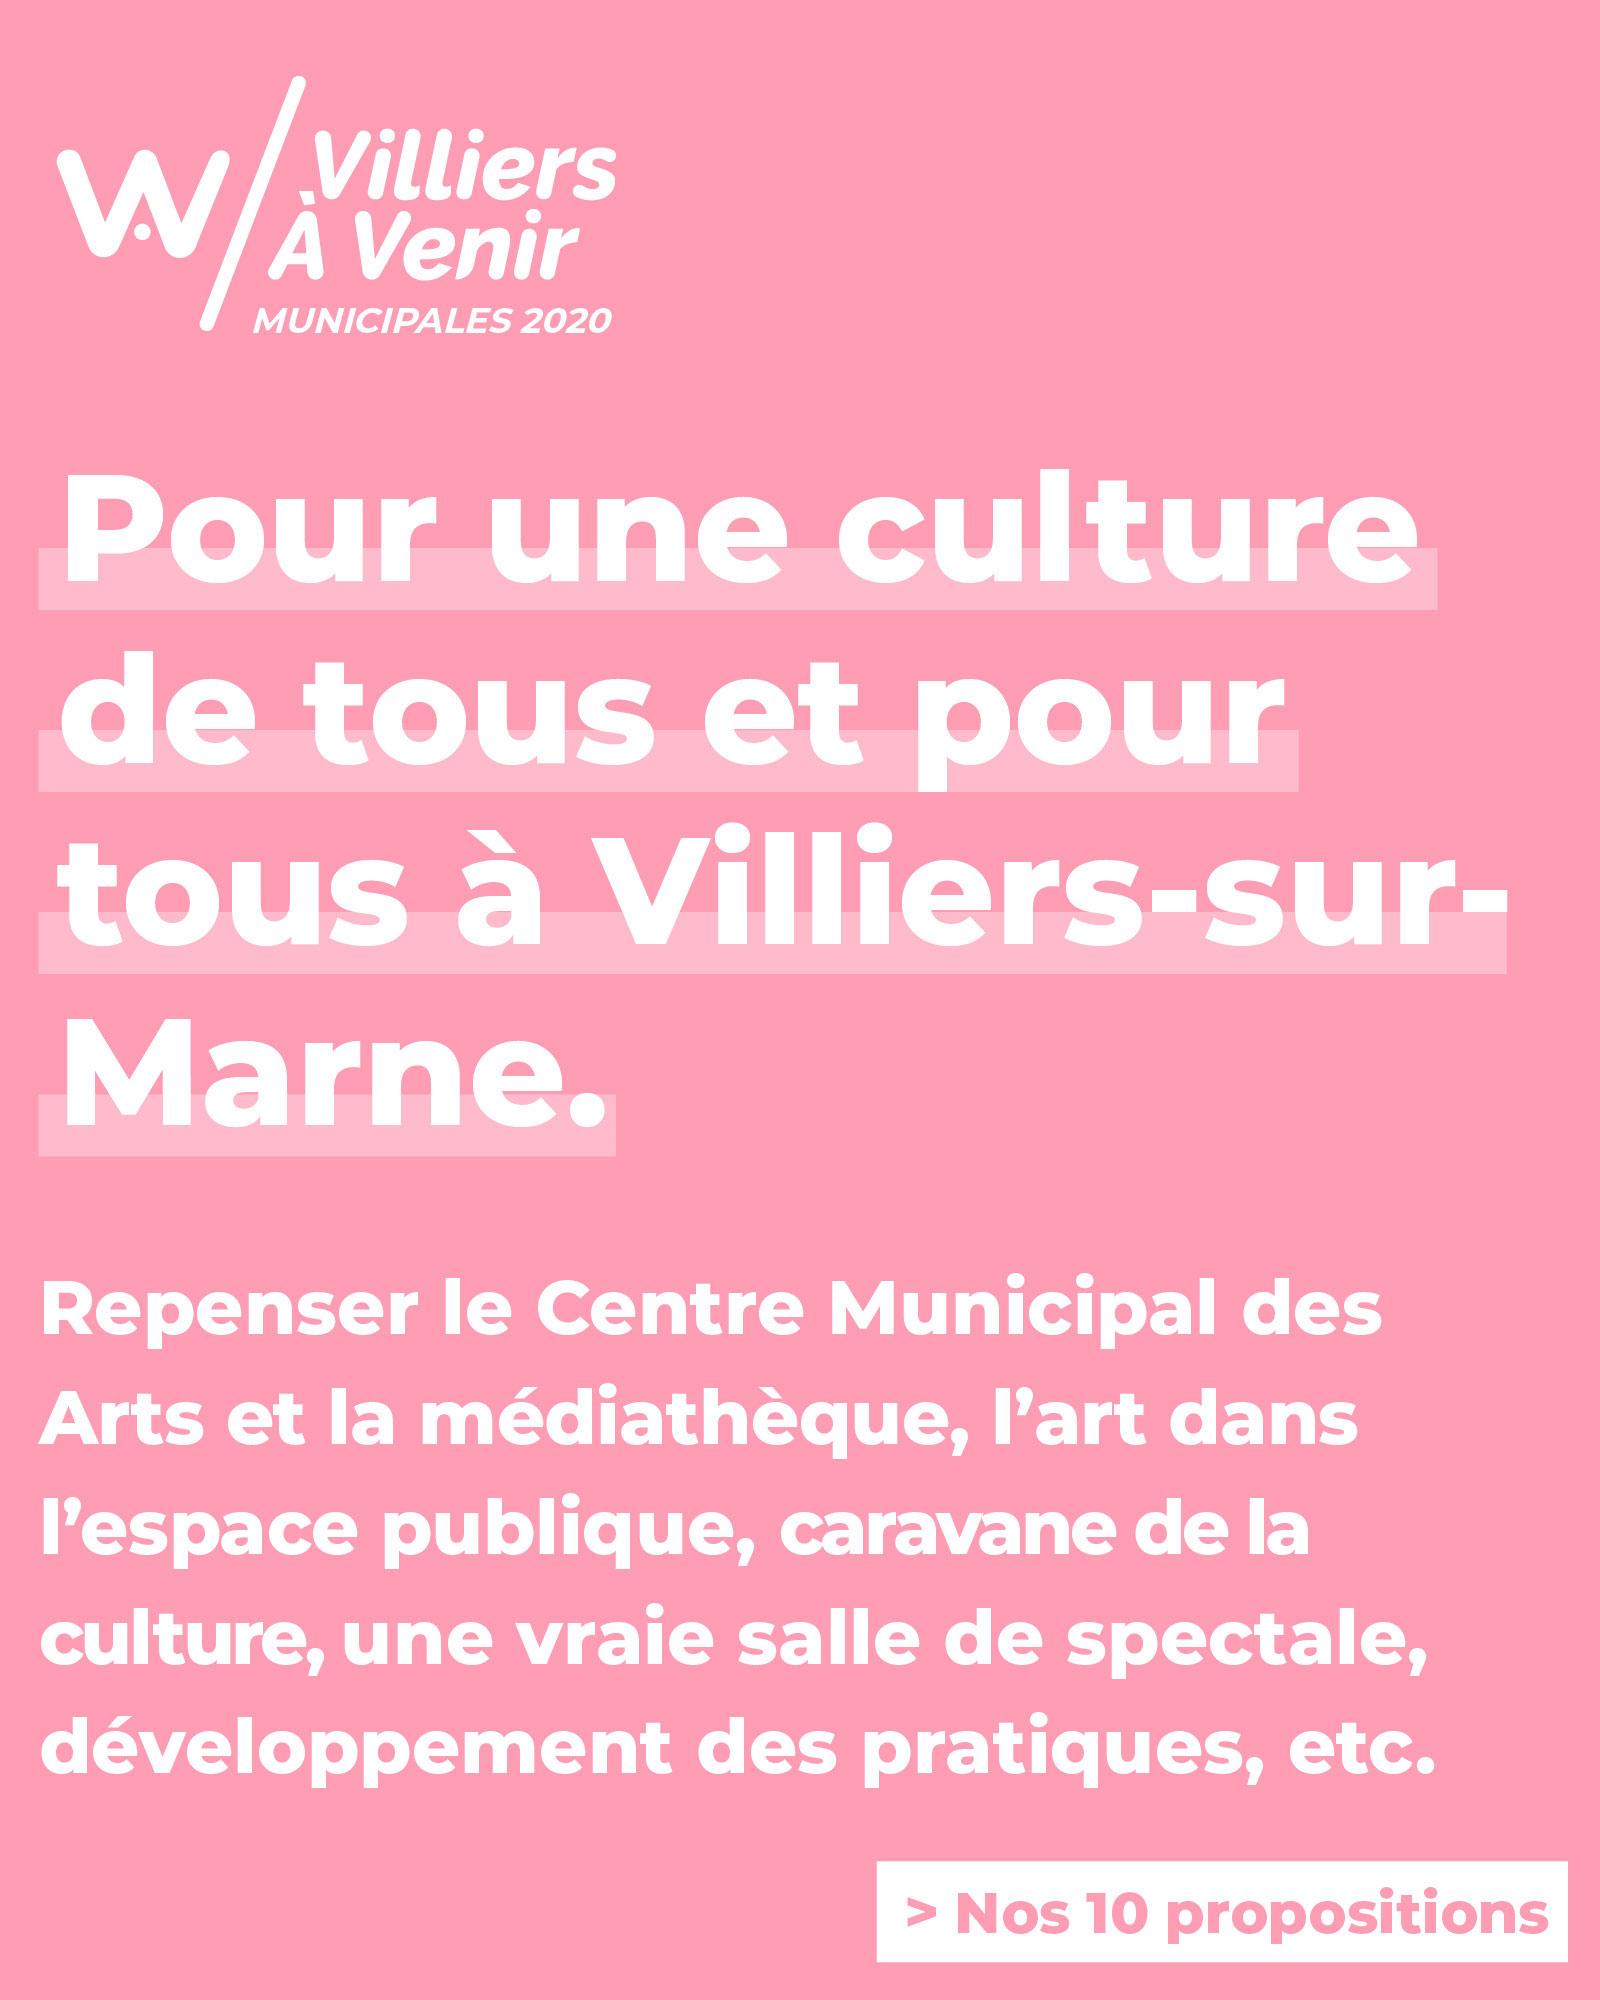 https://vav94.fr/wp-content/uploads/2020/02/CULTURE-PROGRAMME-VILLIERS-SUR-MARNE-MUNICIPALES-2020-VILLIERS-A-VENIR-VAV.jpg